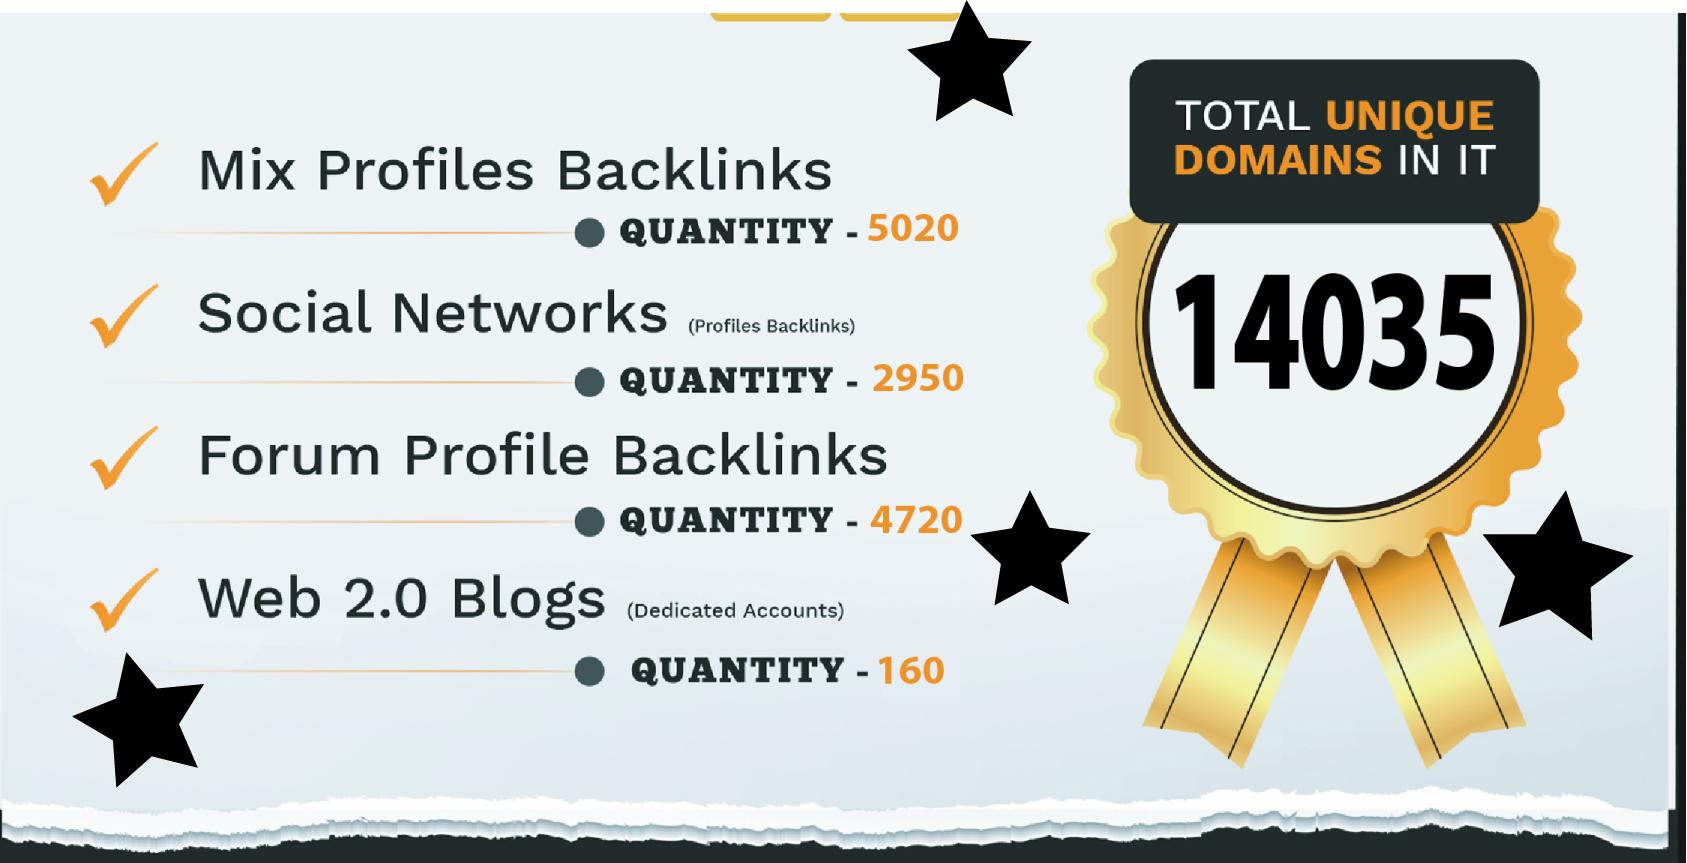 Get 12850 PR7-9-Mix Profiles-Social-Forum-Web 2.0 Backlinks Rank Your website Google 1st Page